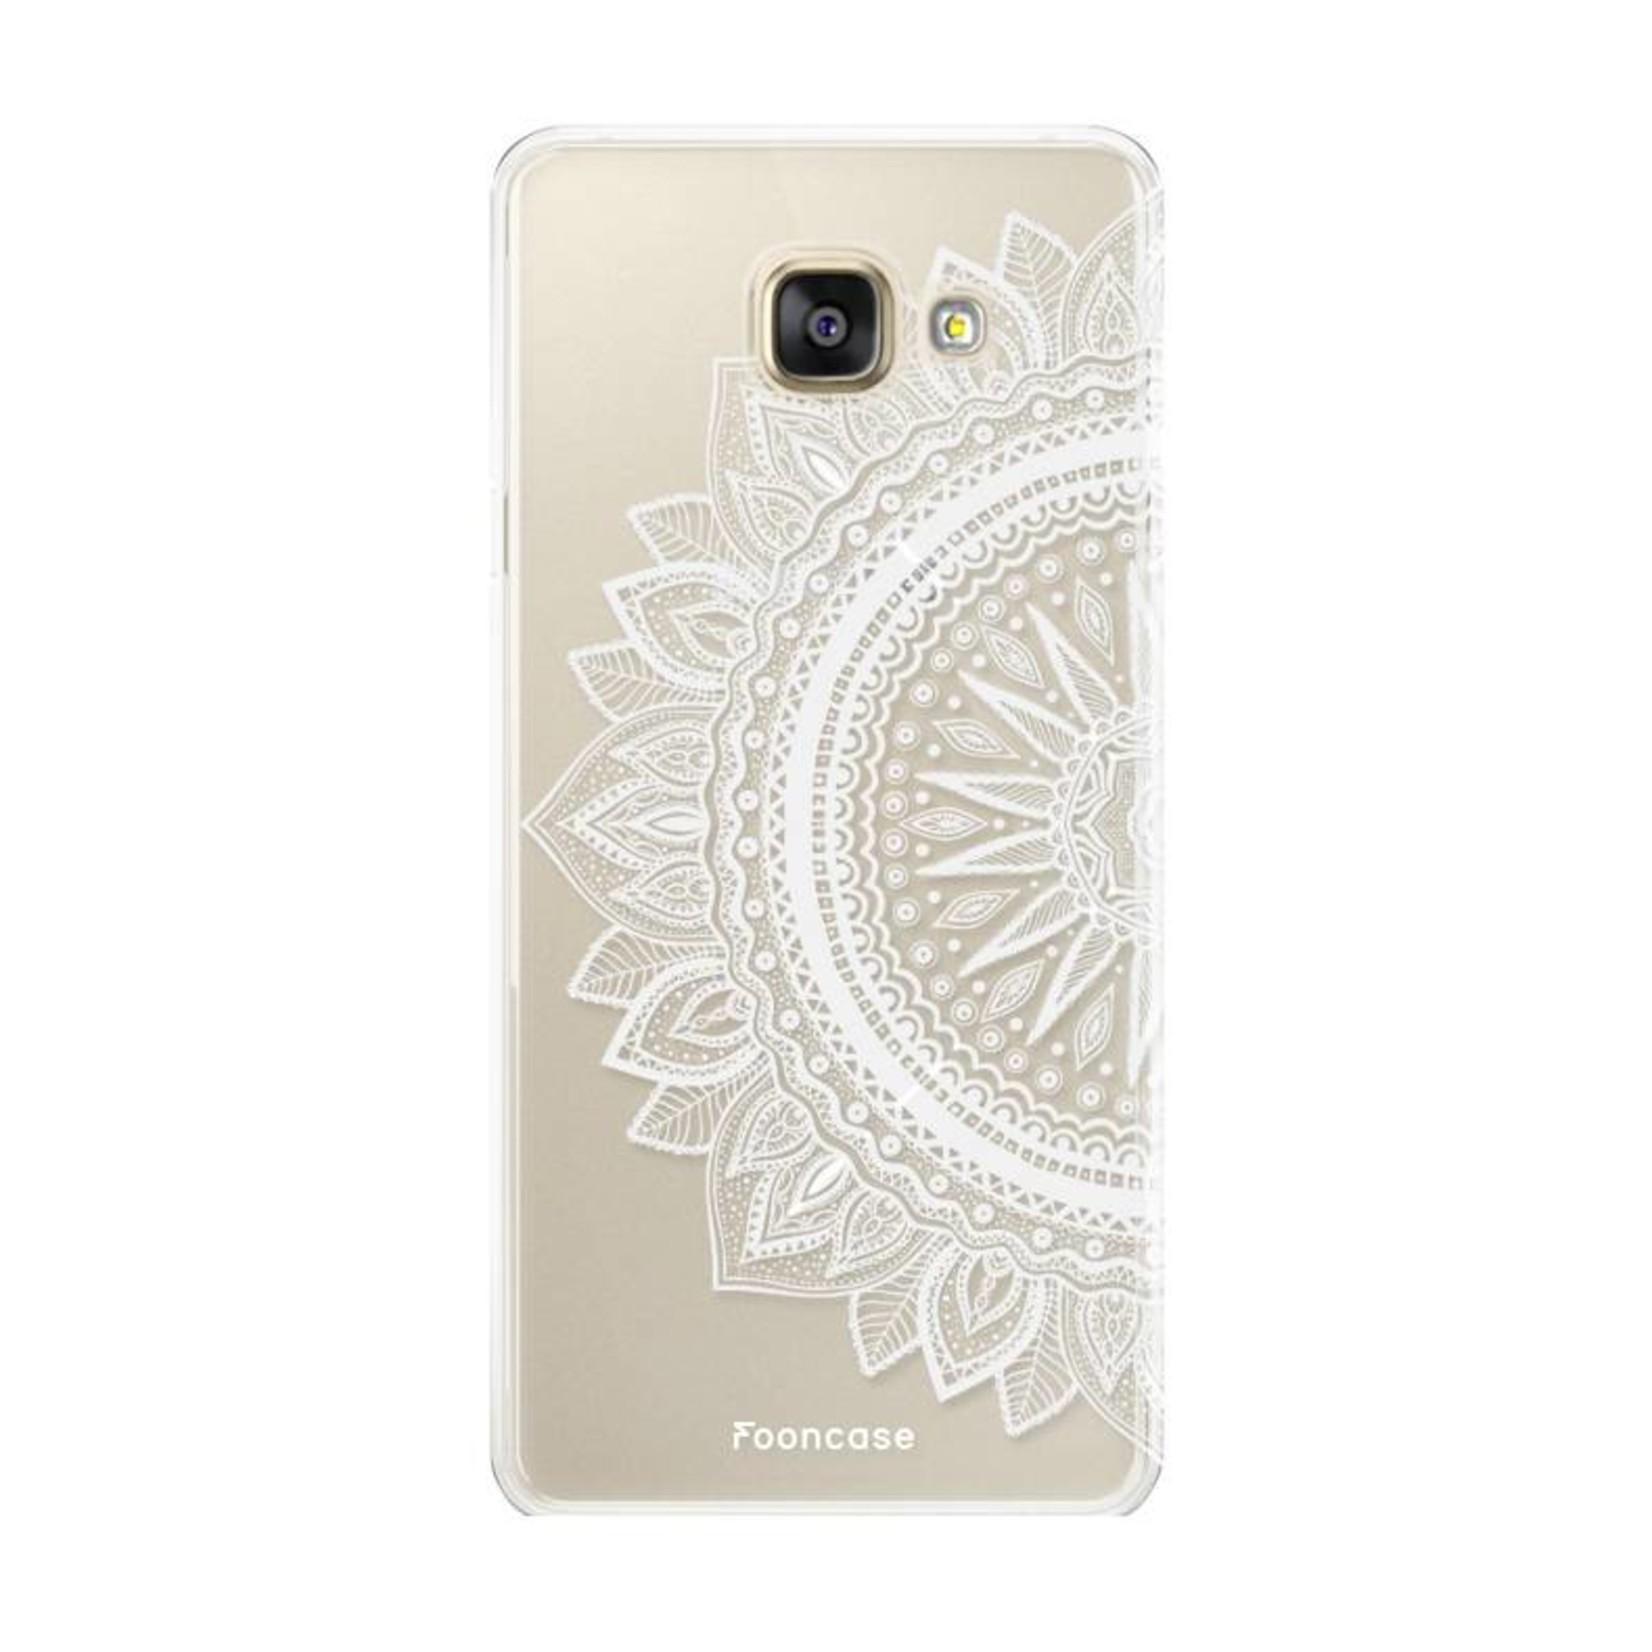 FOONCASE Samsung Galaxy A3 2016 hoesje TPU Soft Case - Back Cover - Mandala / Ibiza